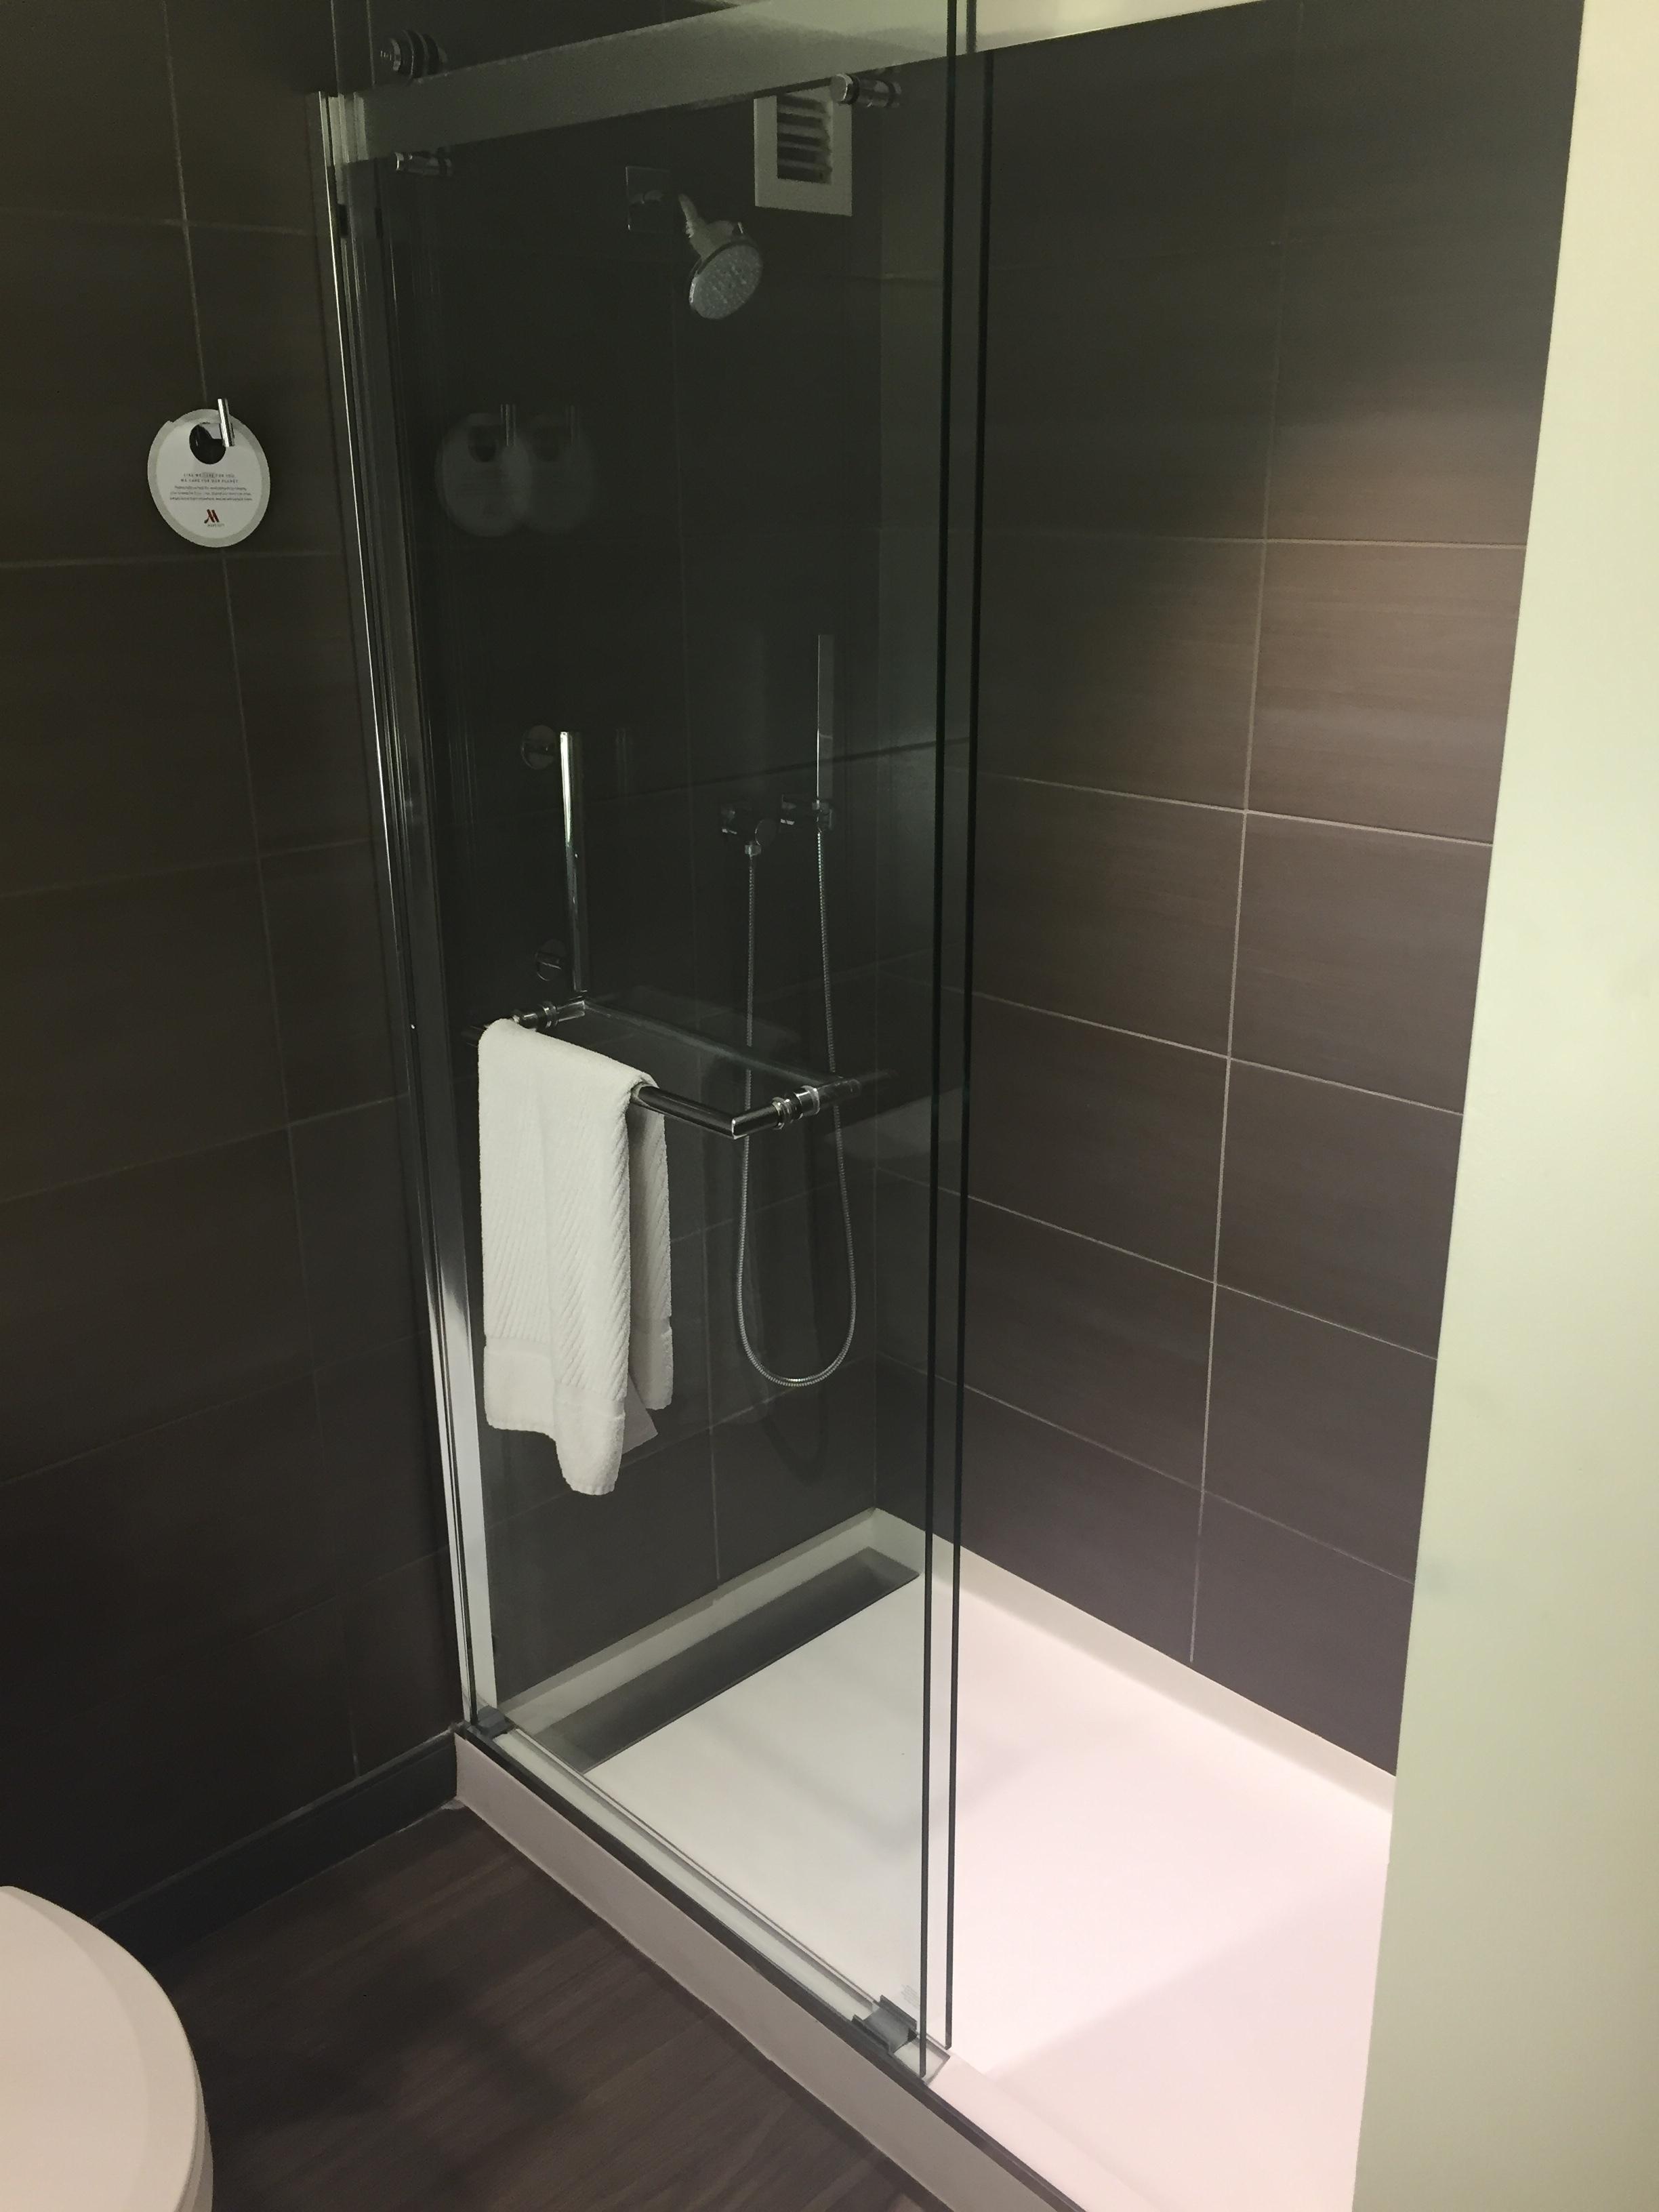 Multiple shower heads in the walk-in shower.